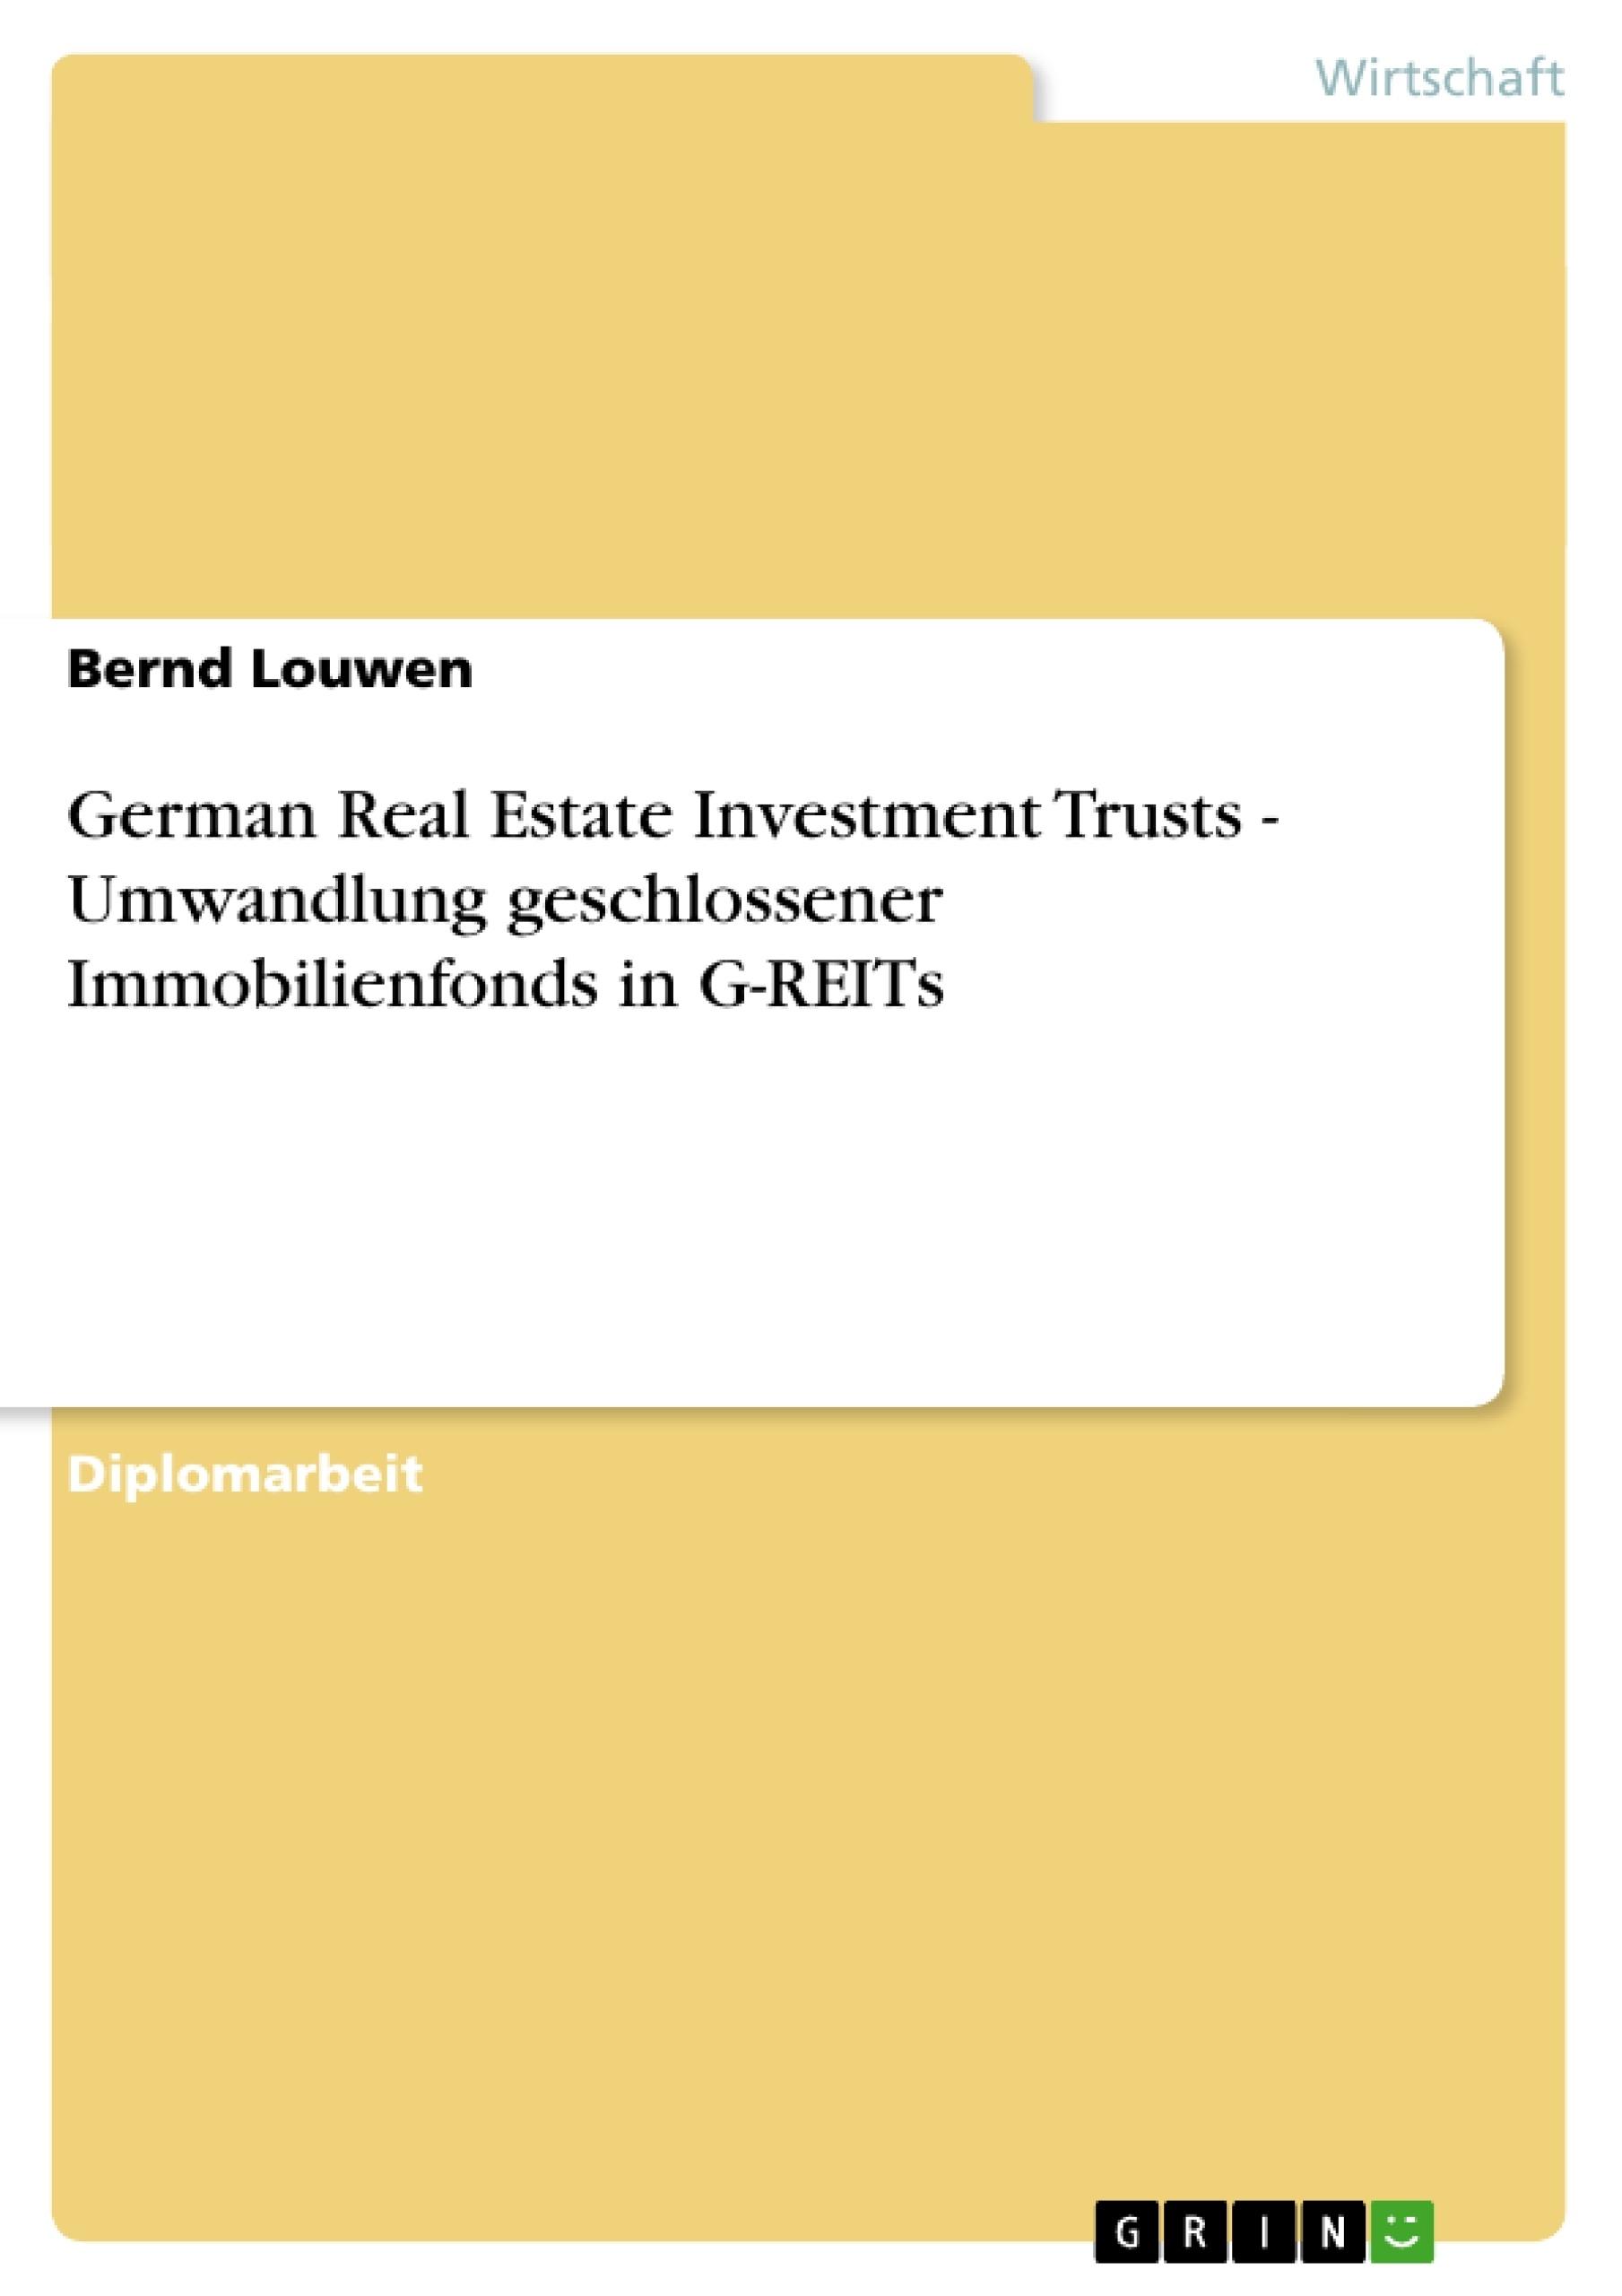 Titel: German Real Estate Investment Trusts - Umwandlung geschlossener Immobilienfonds in G-REITs